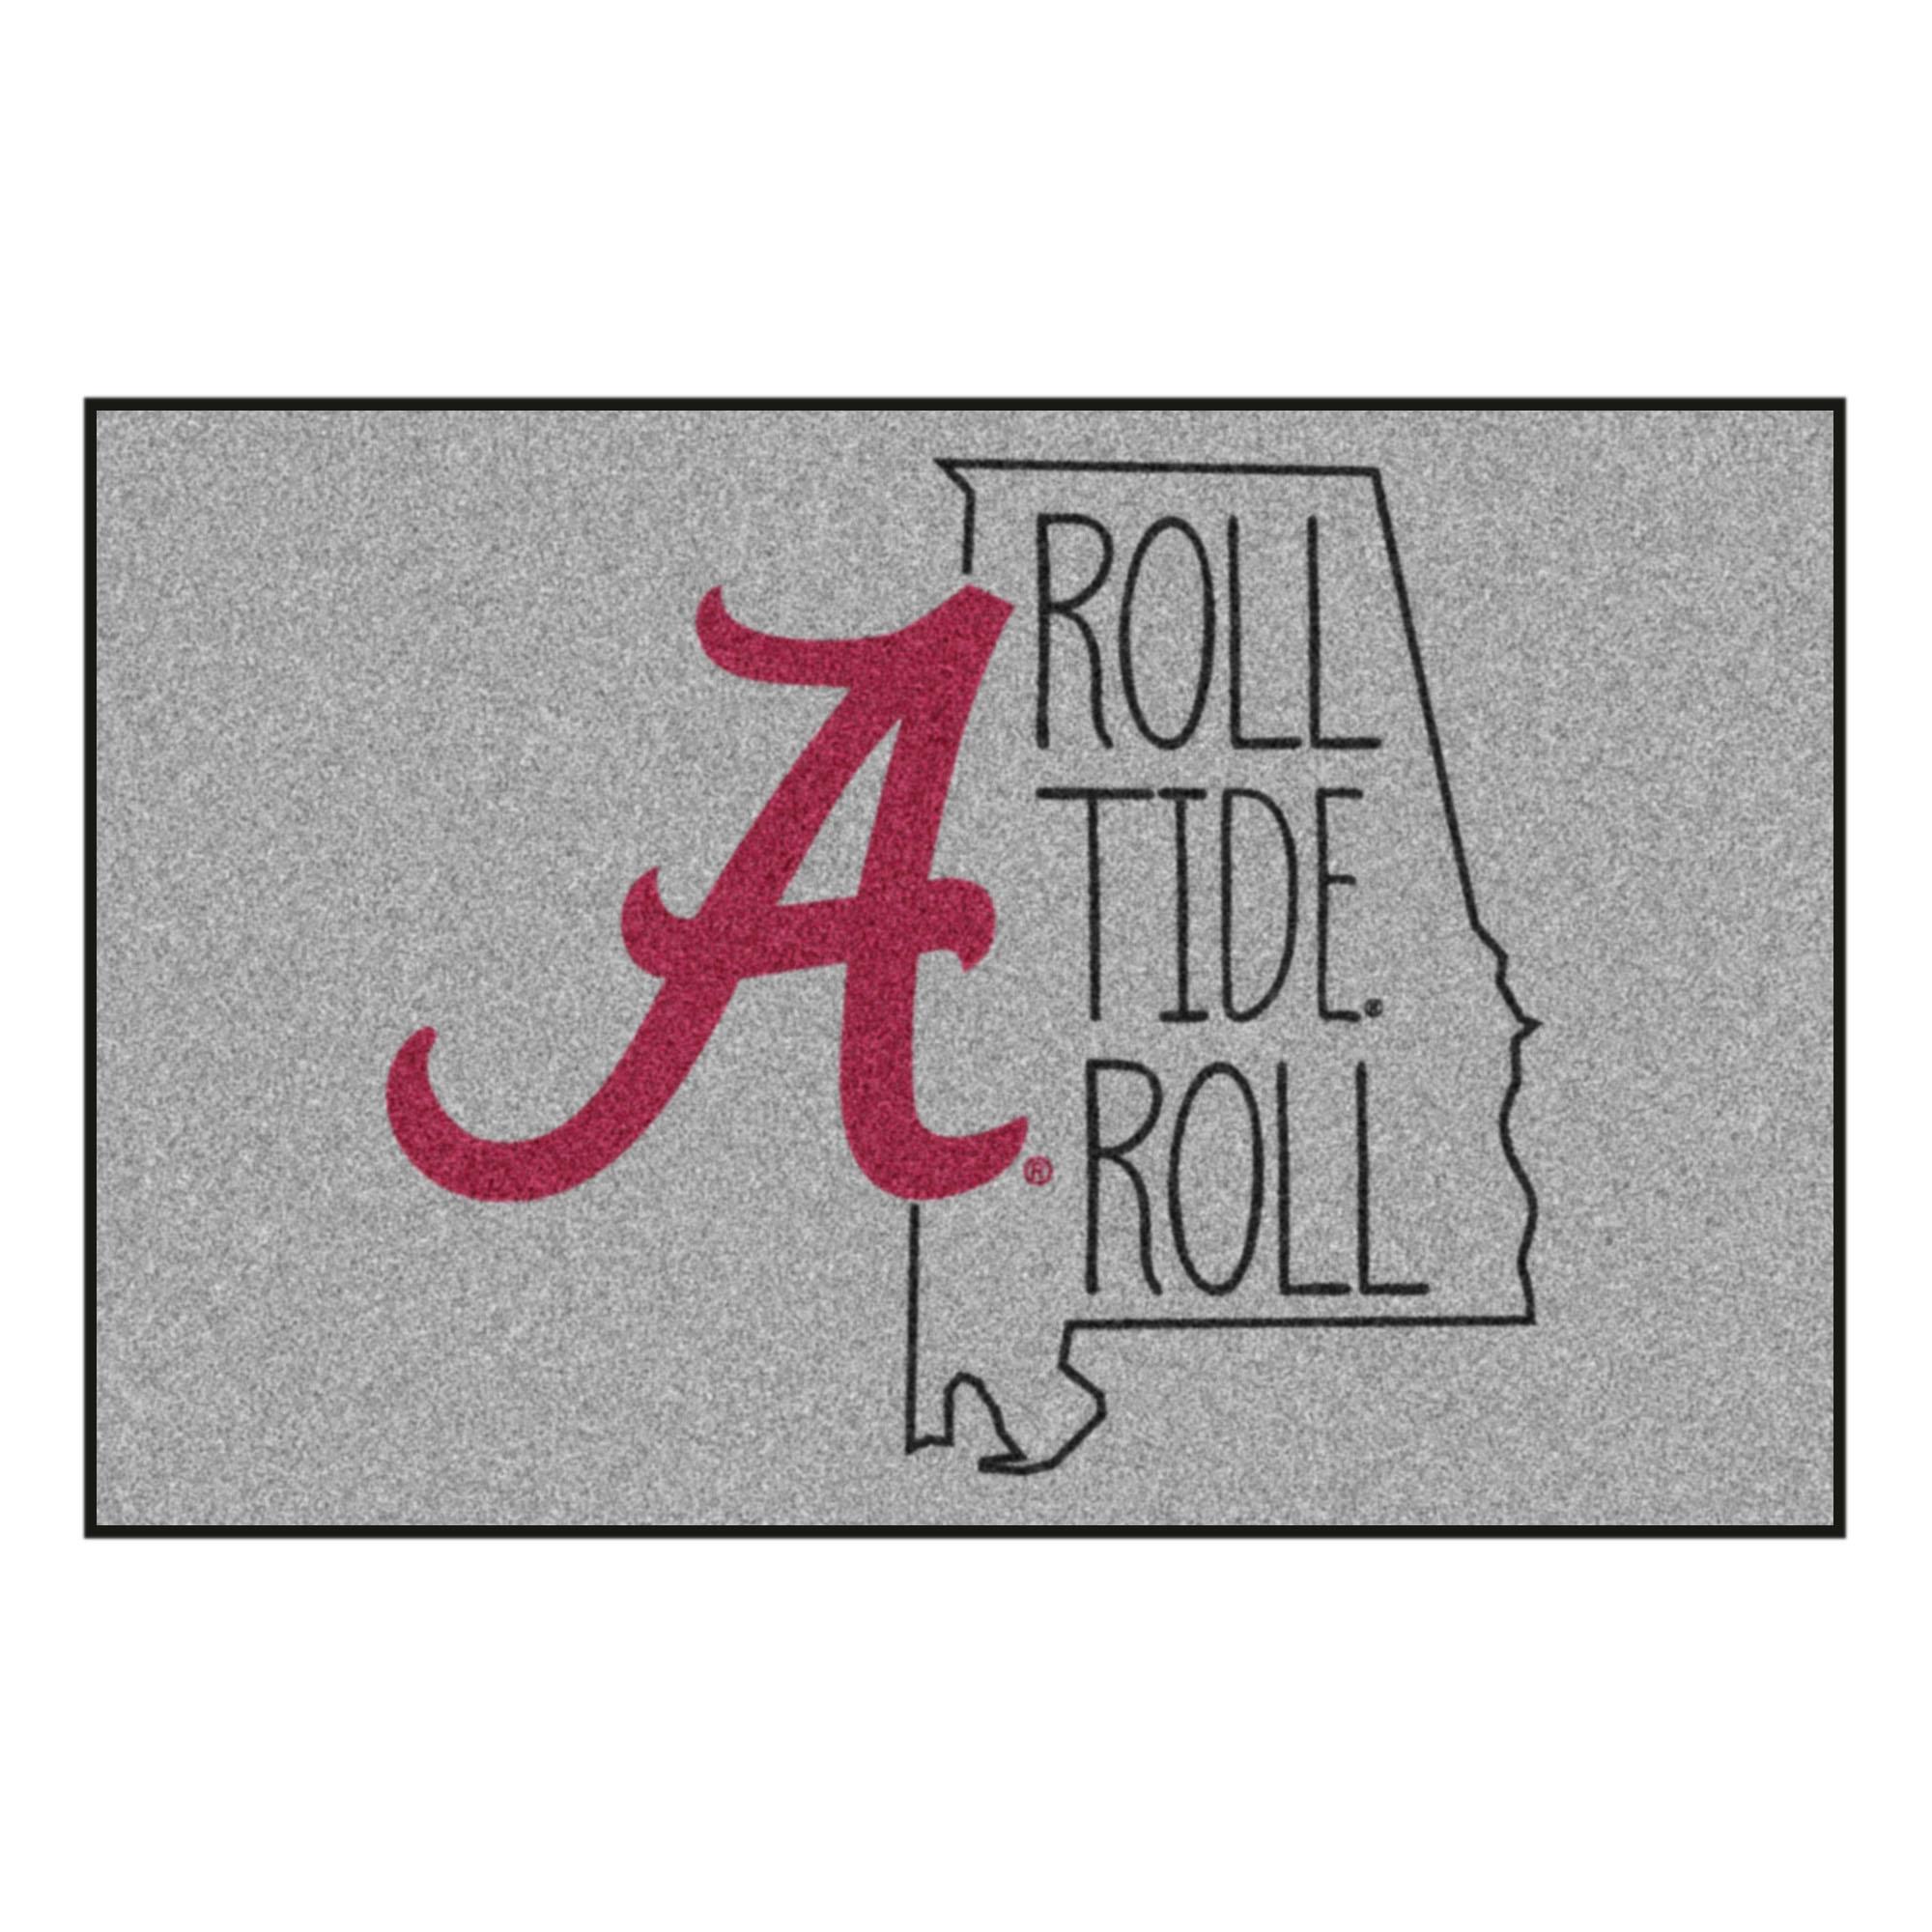 University Of Alabama Southern Style Rug 646648080143 Ebay